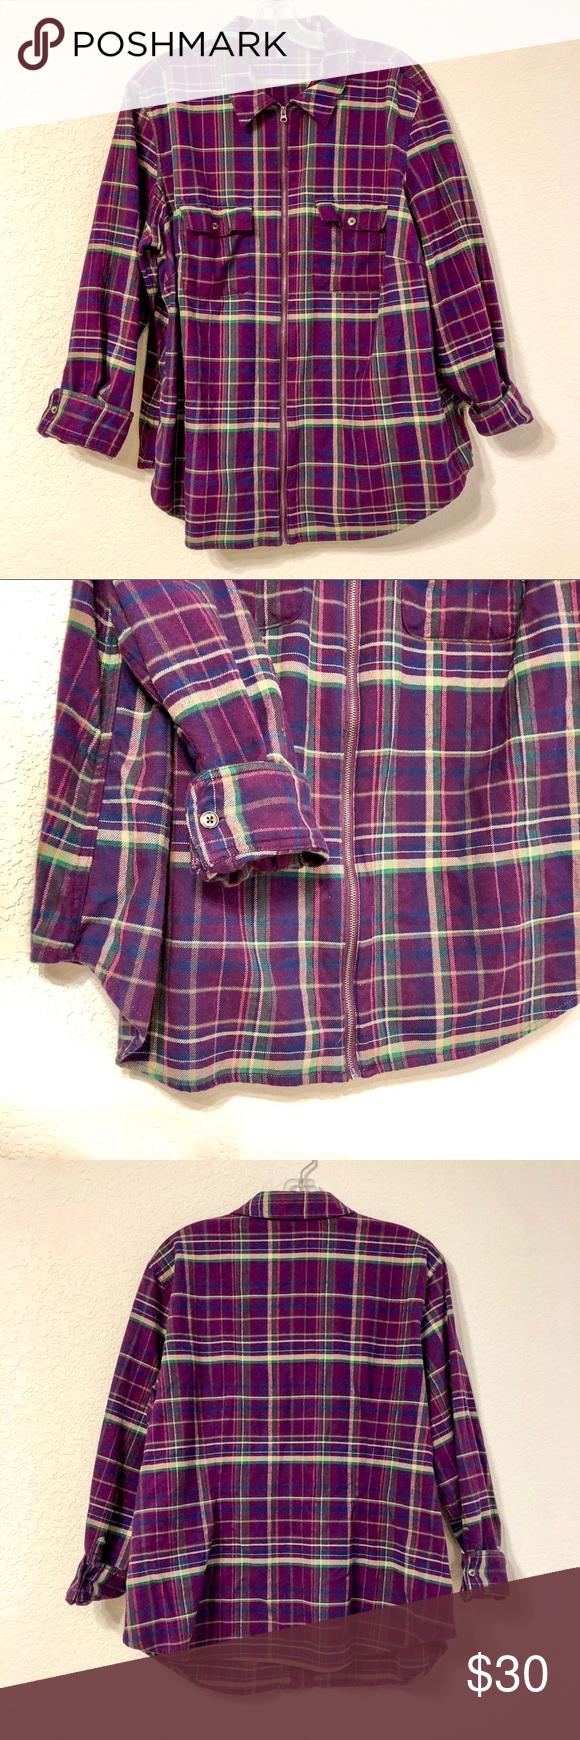 9ffd3f92a72 Chaps Raspberry Plaid Flannel Jacket NWOT Chaps Women s Plus Size Raspberry  plaid Flannel jacket. Thick